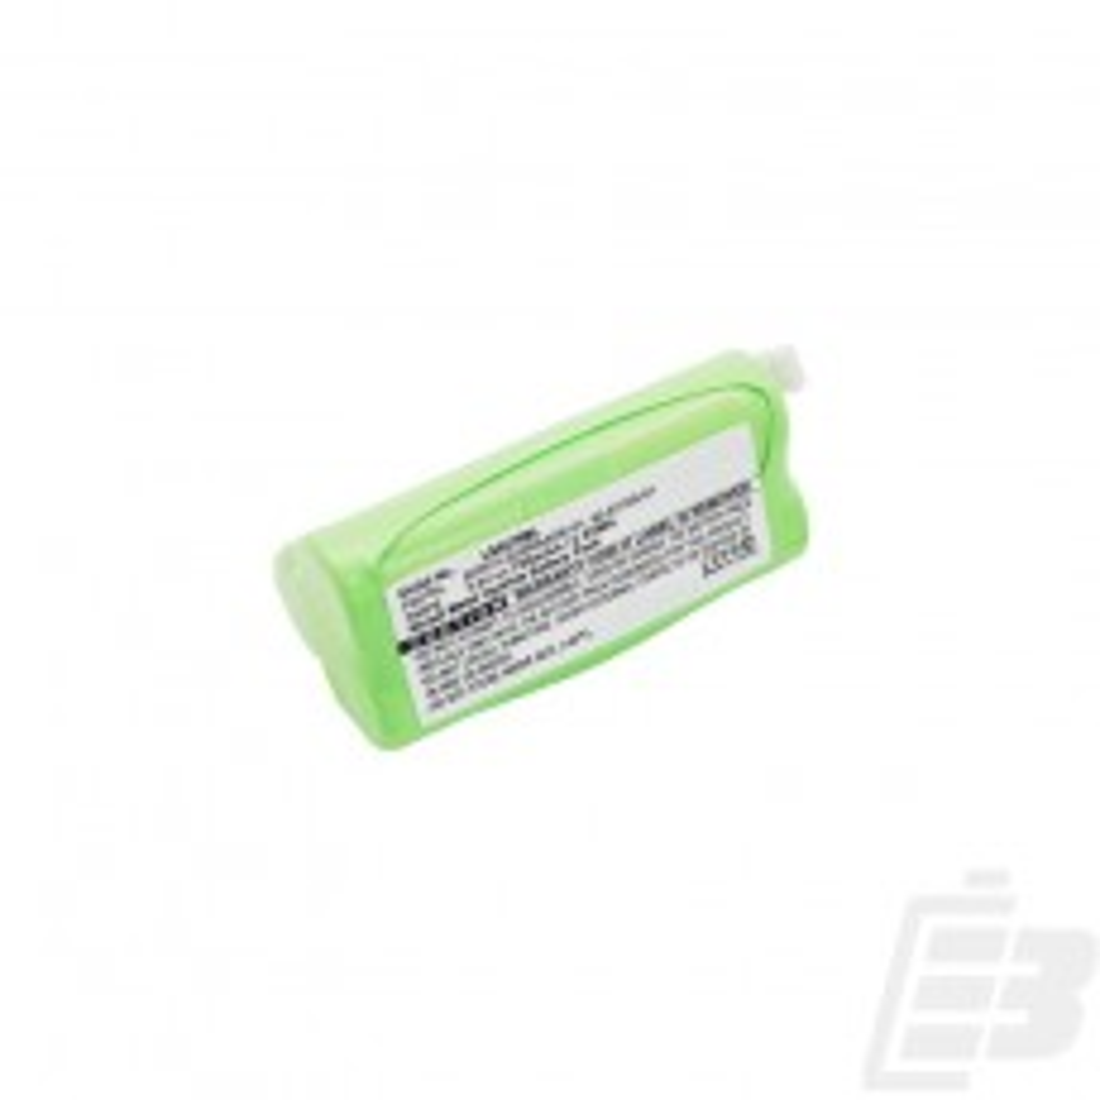 Barcode scanner battery Symbol LS4278_1